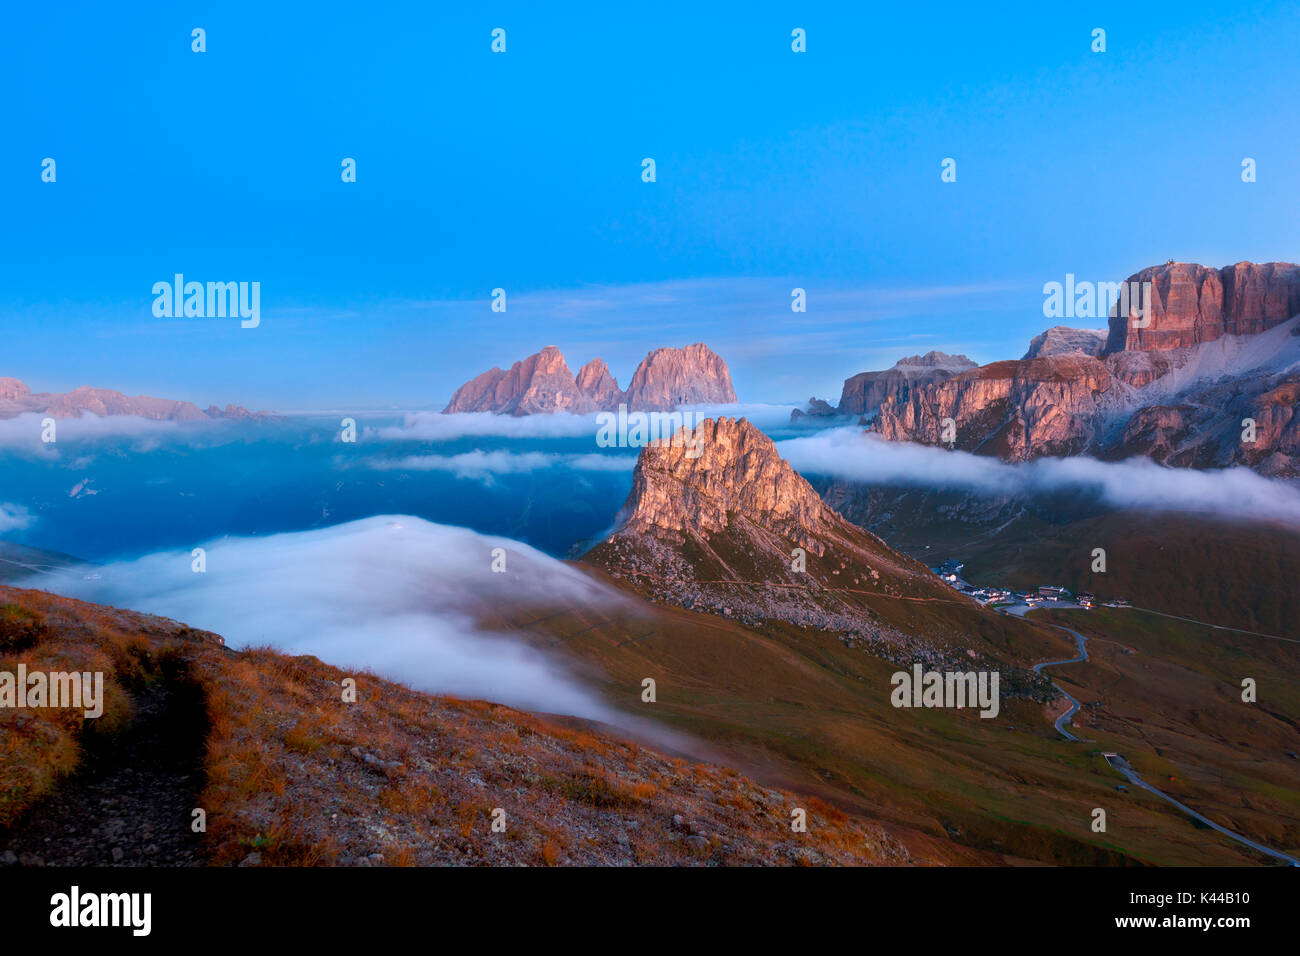 Trentino,Dolomites,Fassa Valley, Europe, Italy, Pordoi pass. - Stock Image